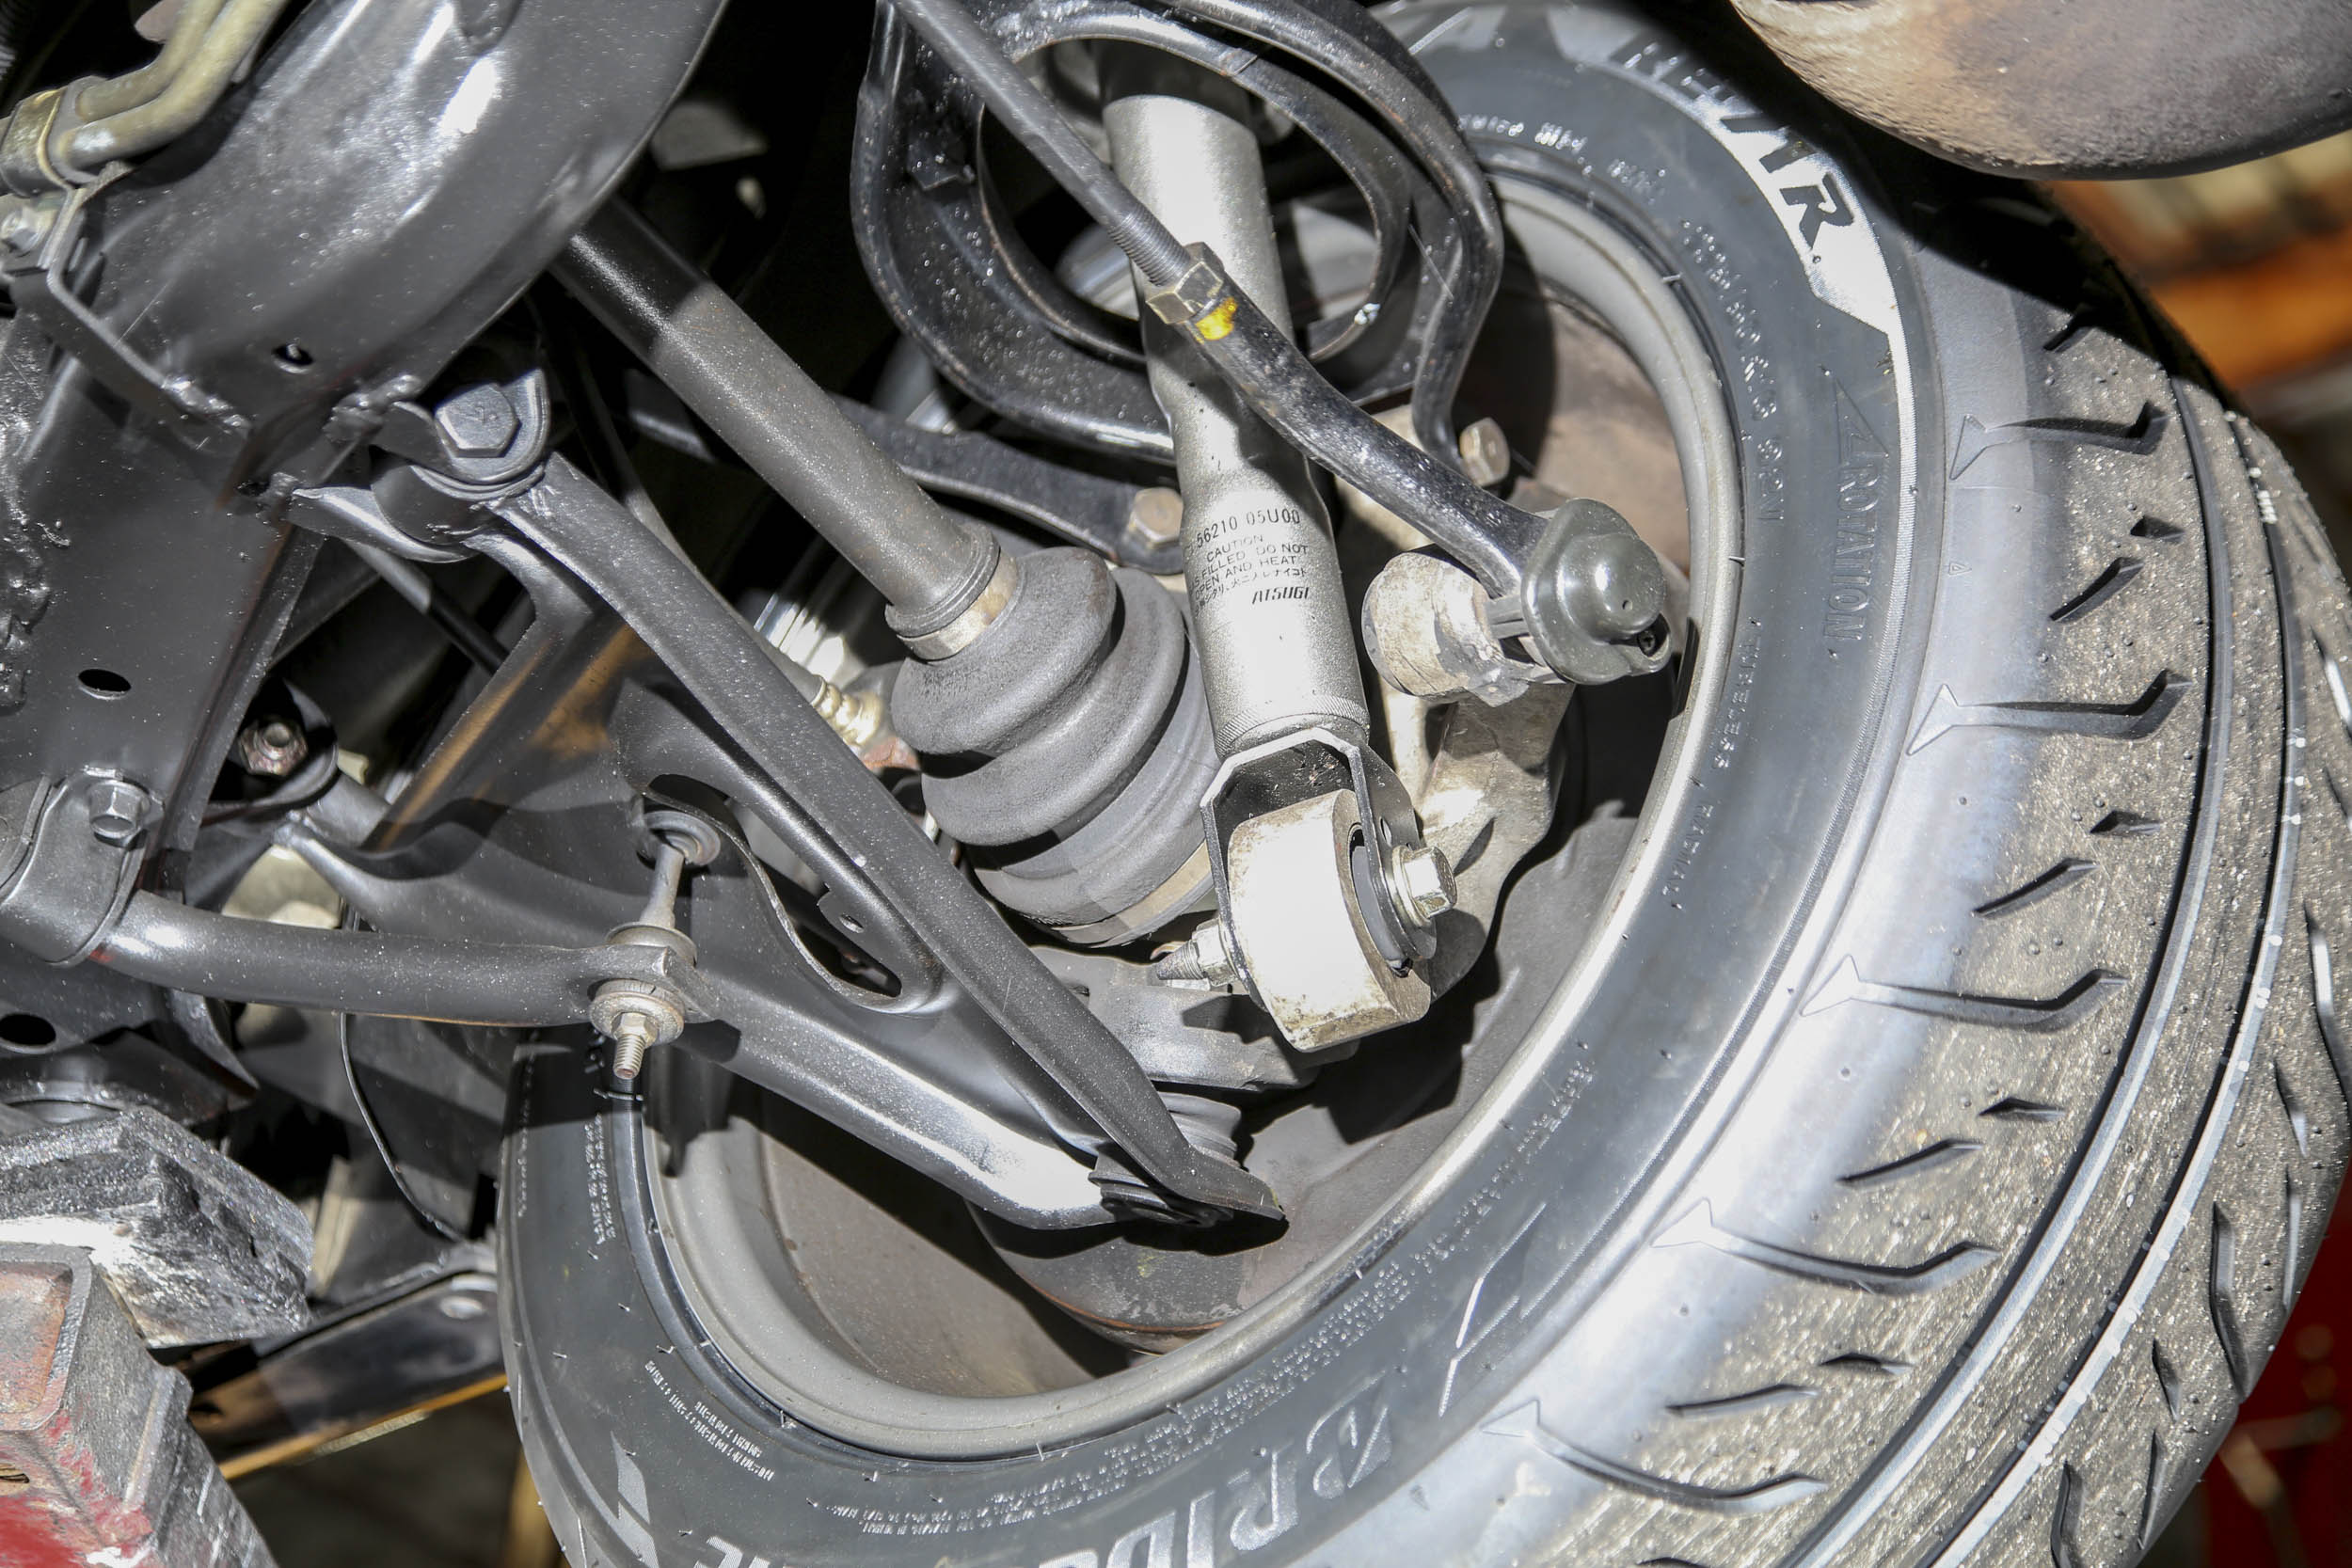 Nissan R32 GT-R rear suspension